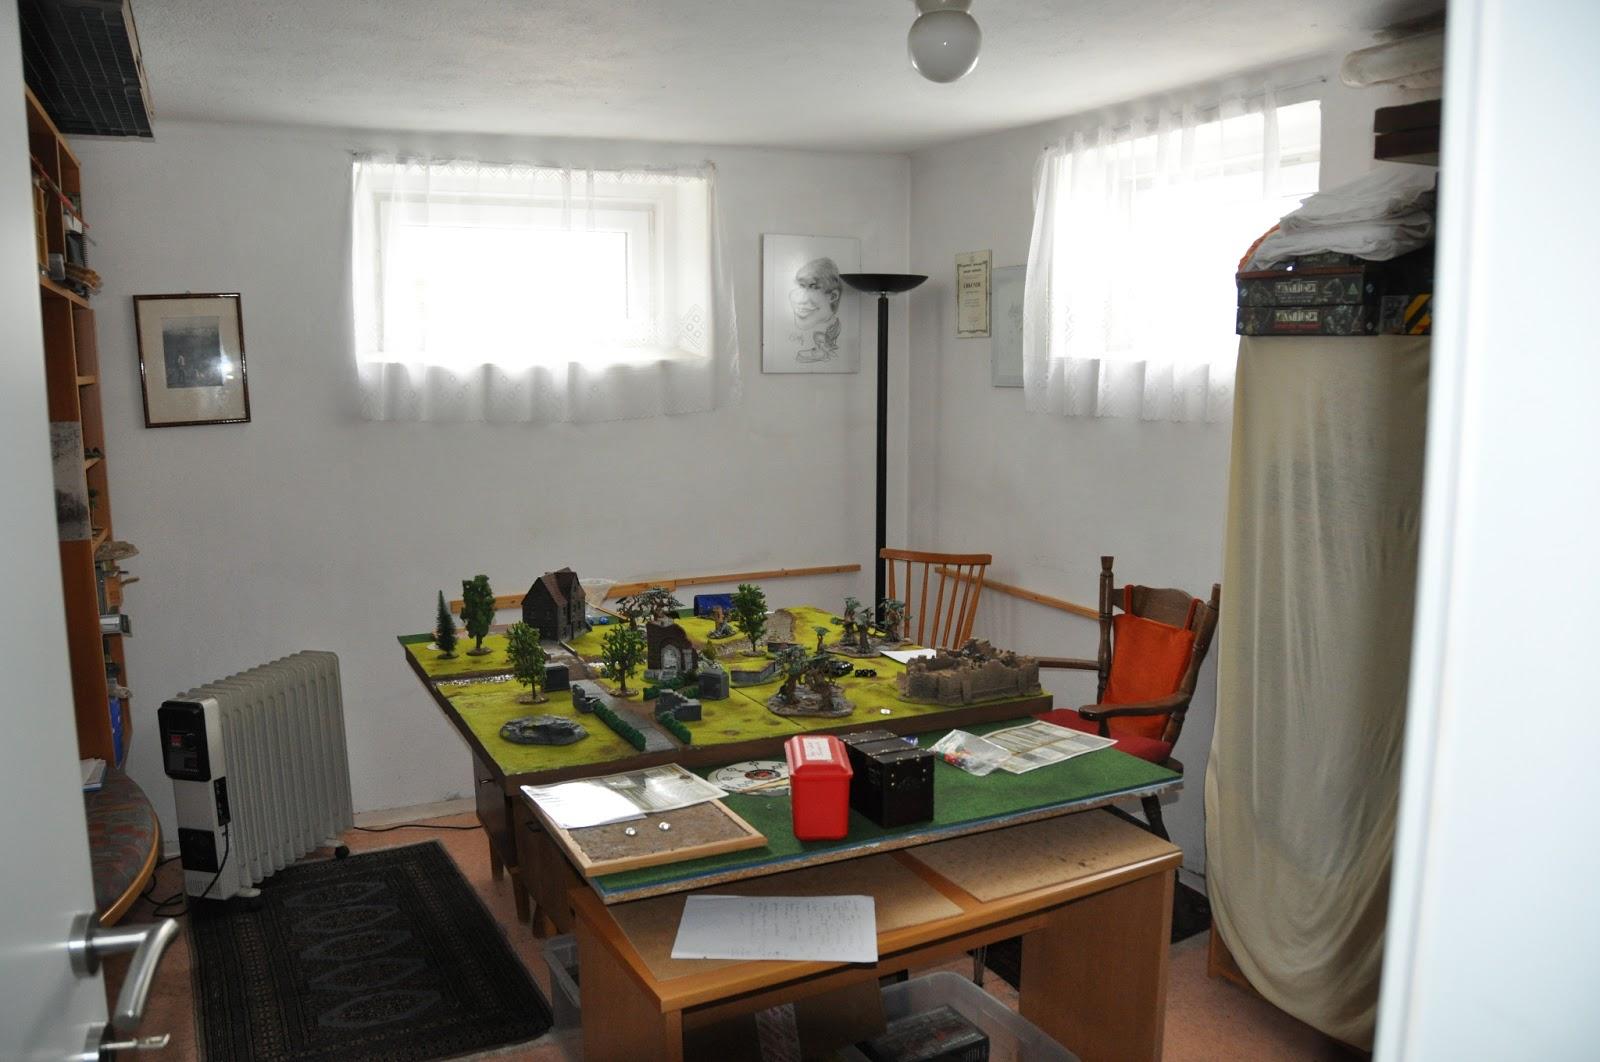 tabletop werkstatt wo findet das hobby statt. Black Bedroom Furniture Sets. Home Design Ideas